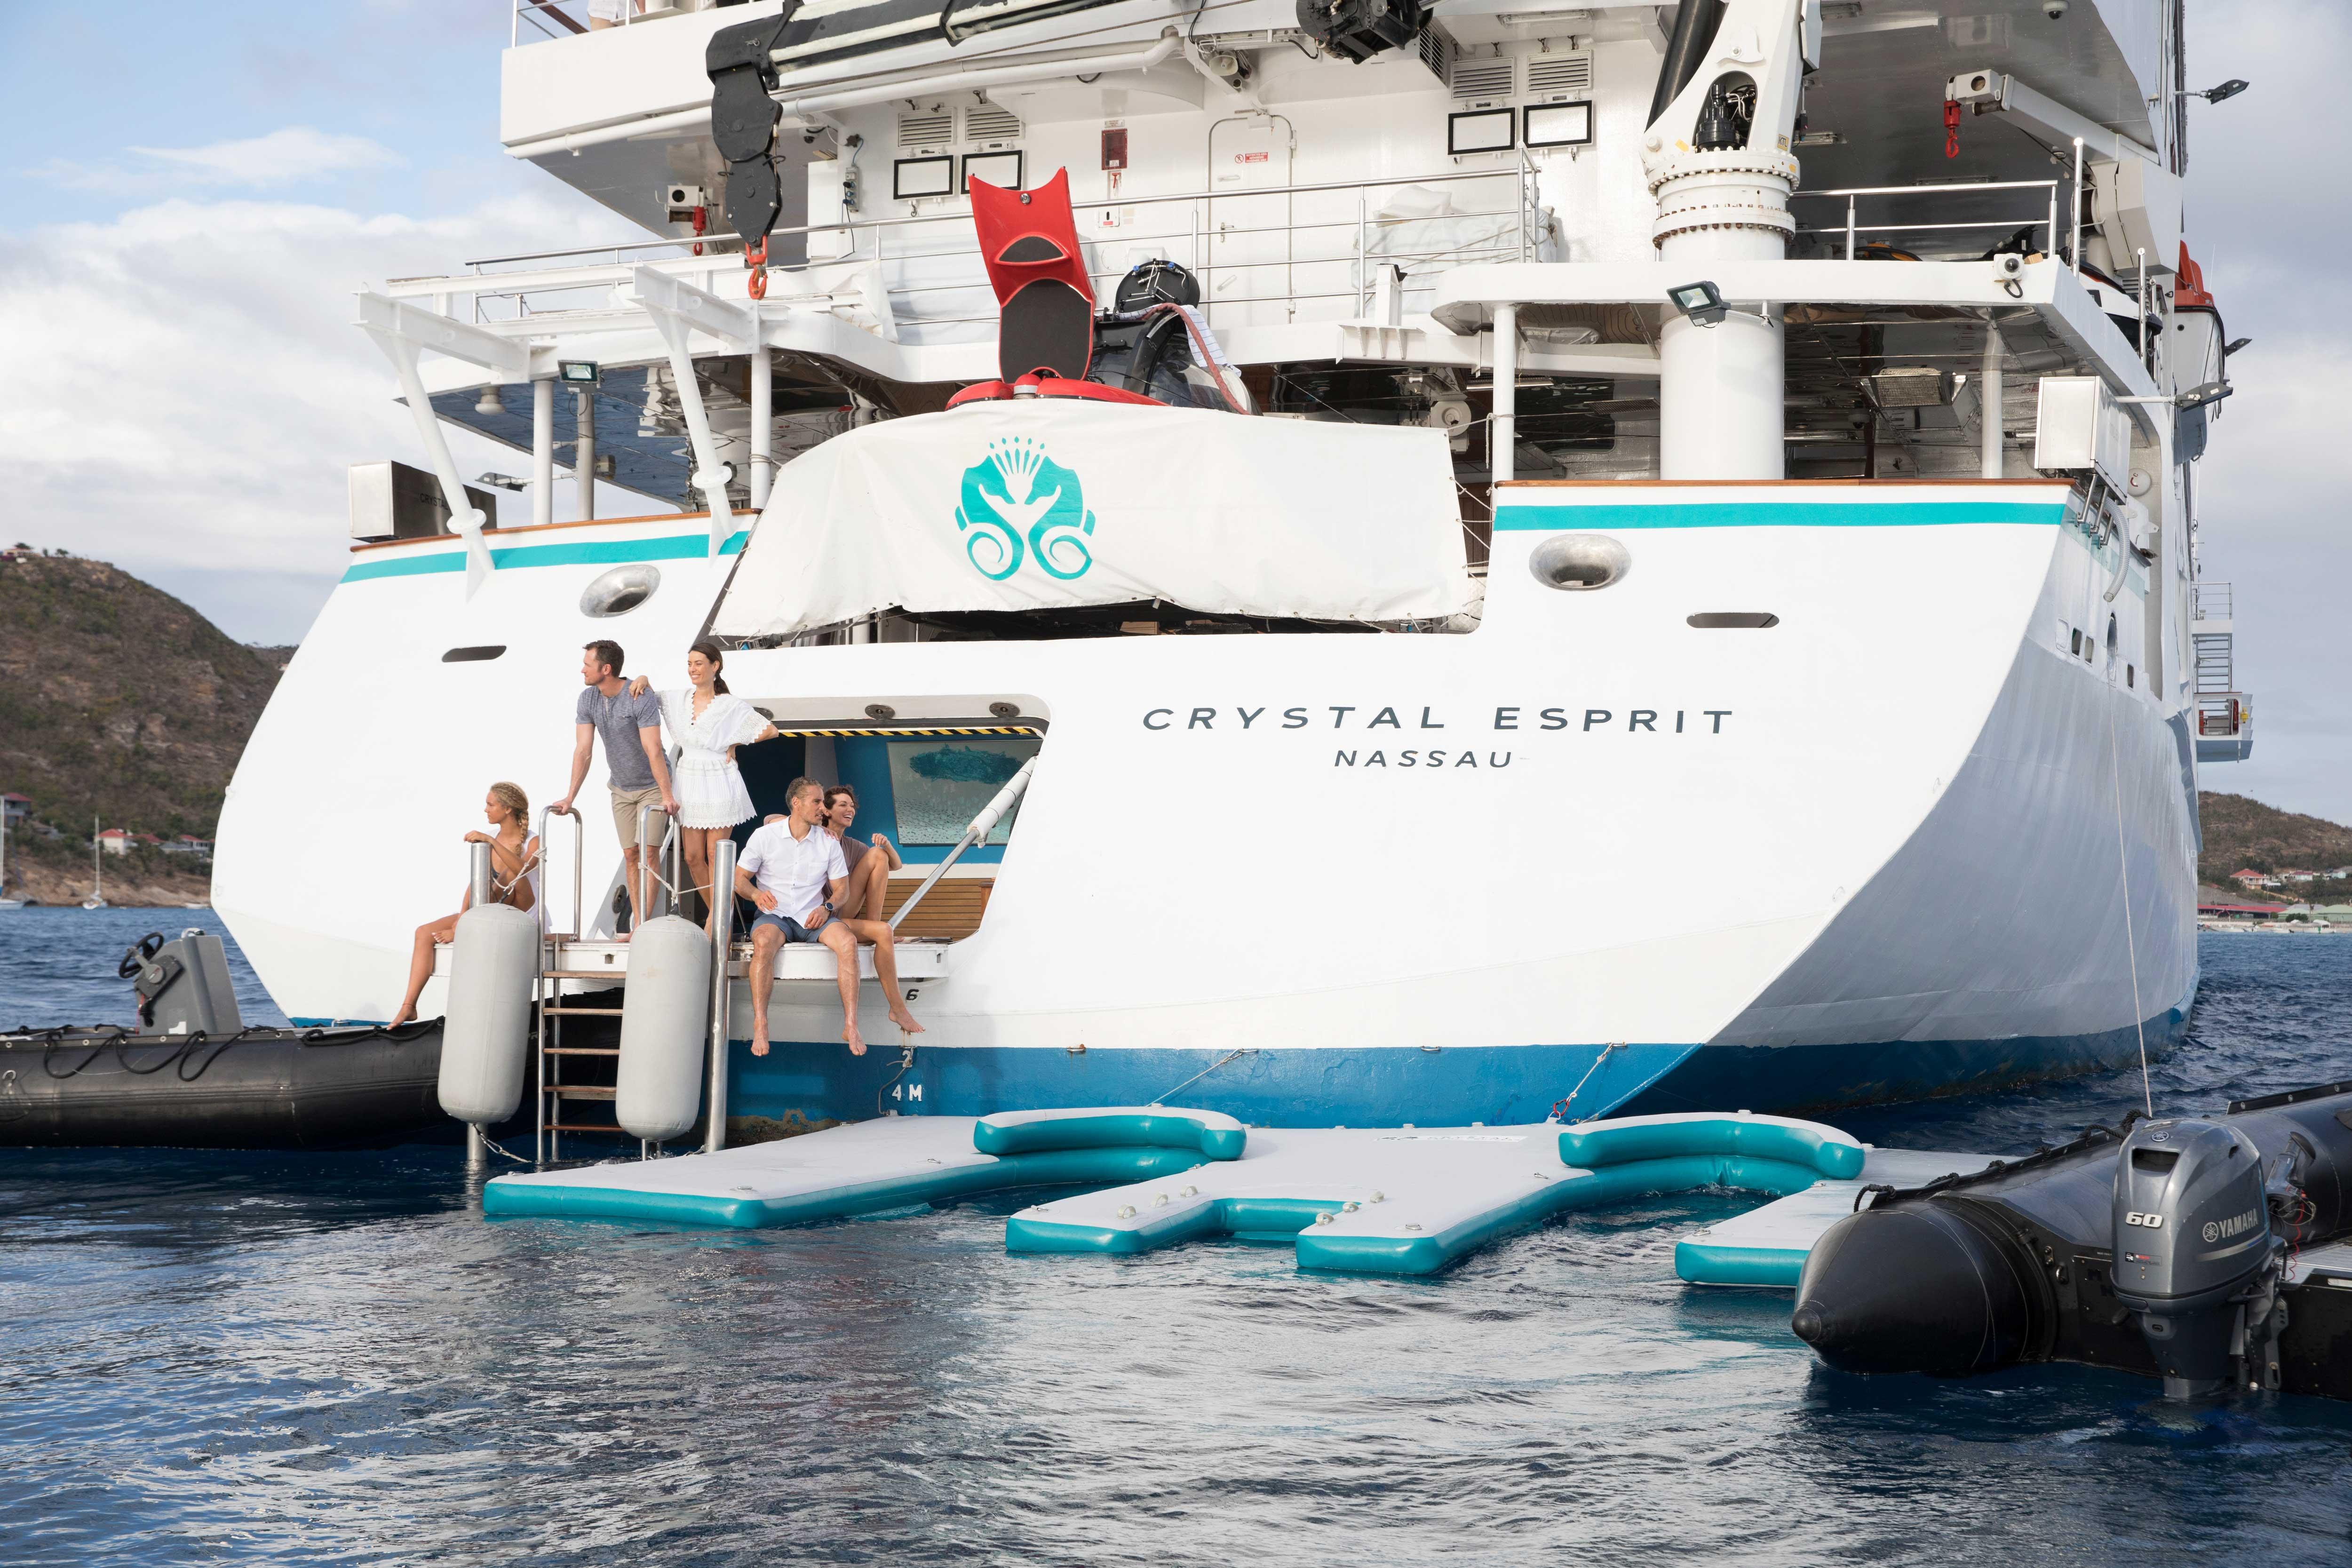 Crystal Esprit  - Crystal Cruises - Detailbild 2